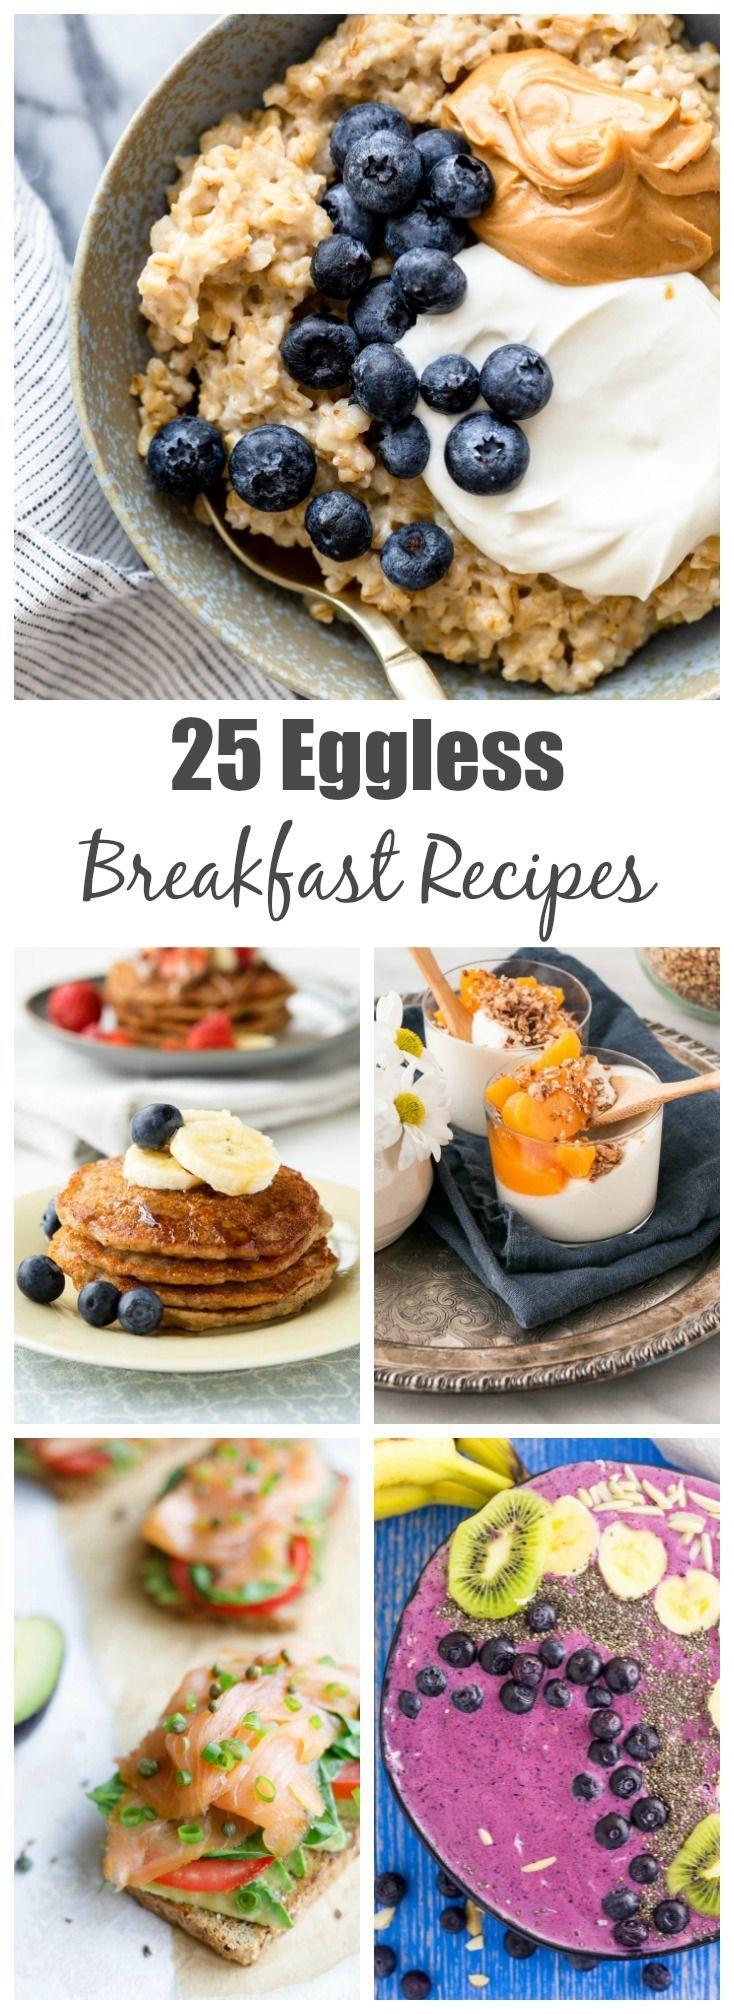 25 Eggless Breakfast Ideas Eggless Breakfast Breakfast Ideas Without Eggs Breakfast For Kids